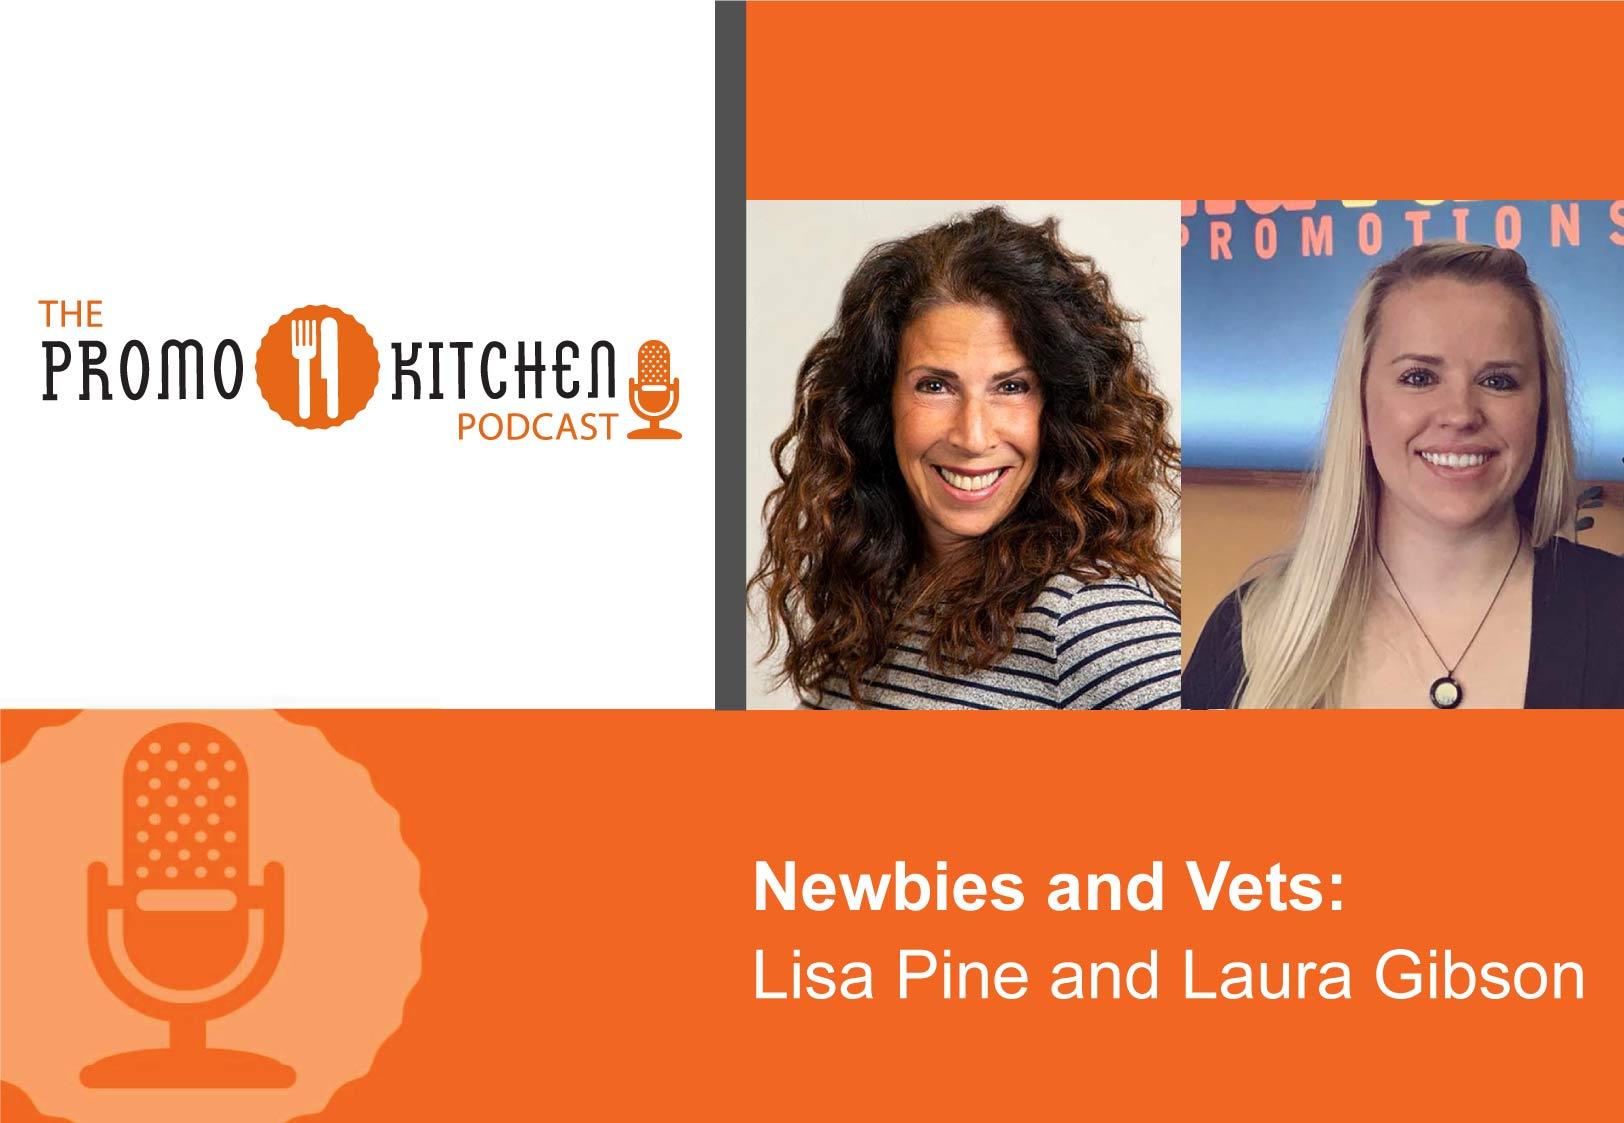 newbies-vets-podcast-lisa-pine-laura-gibson.jpg